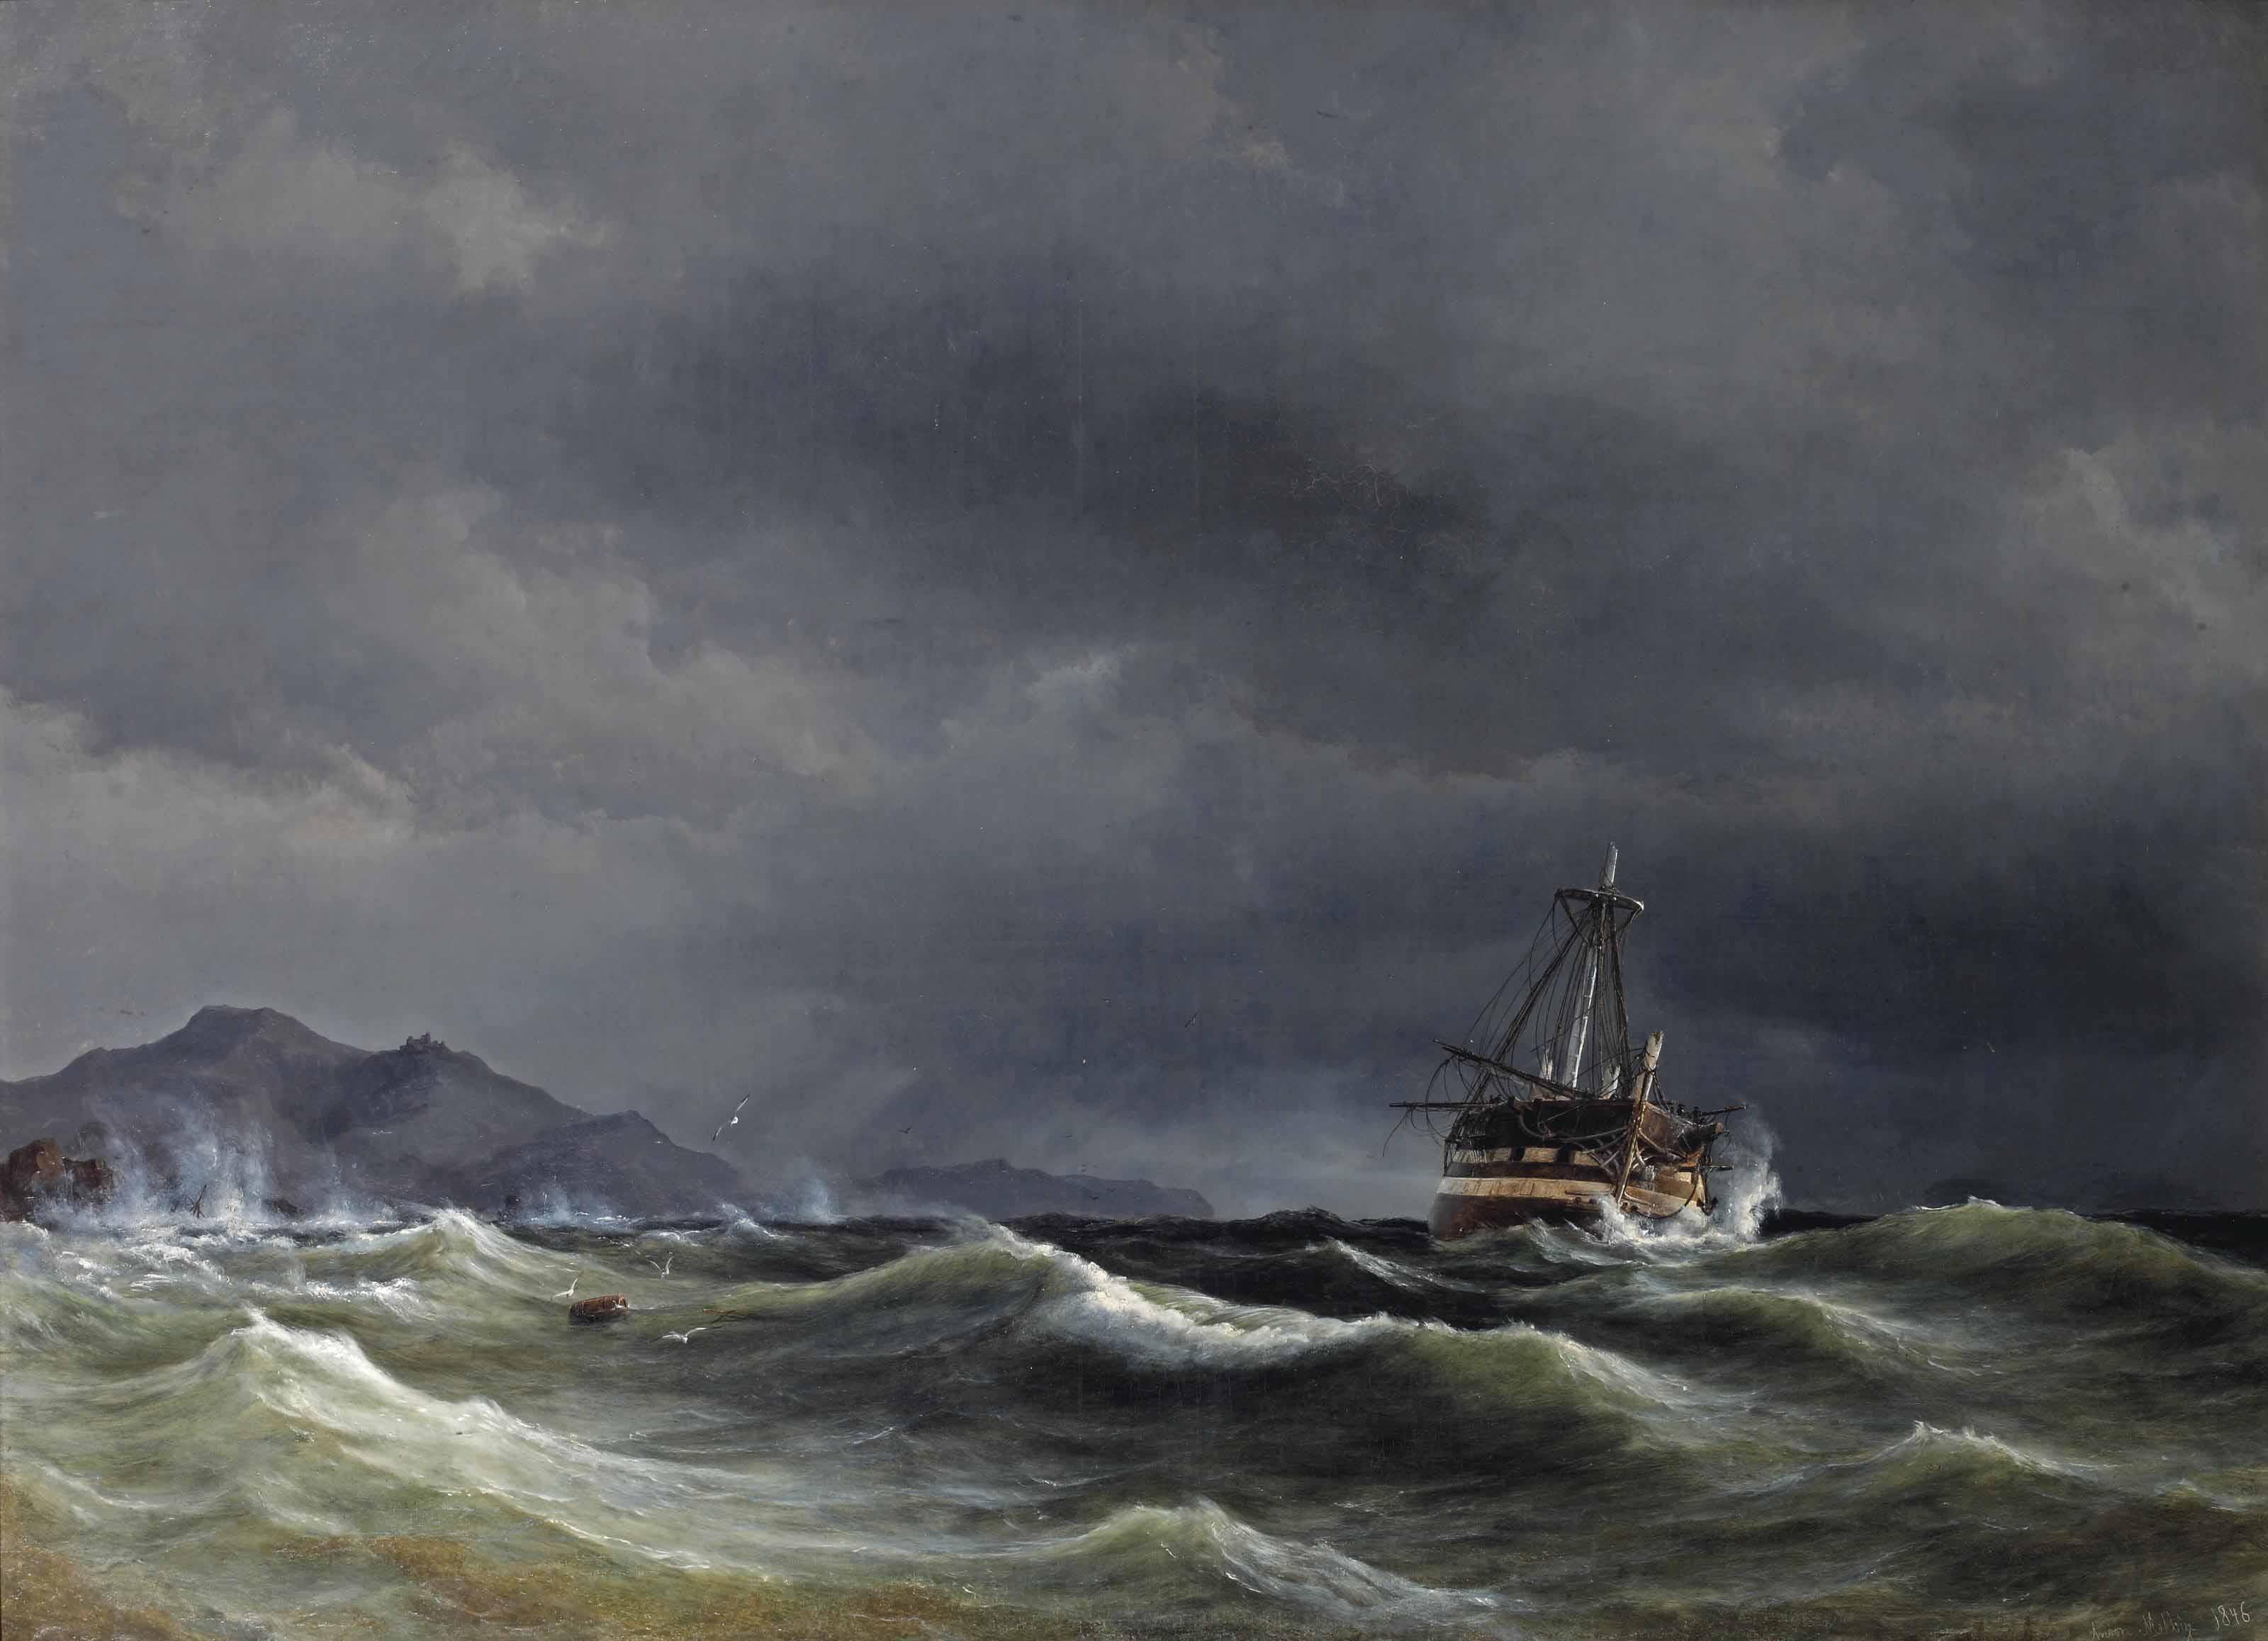 A sailing vessel in rough sea